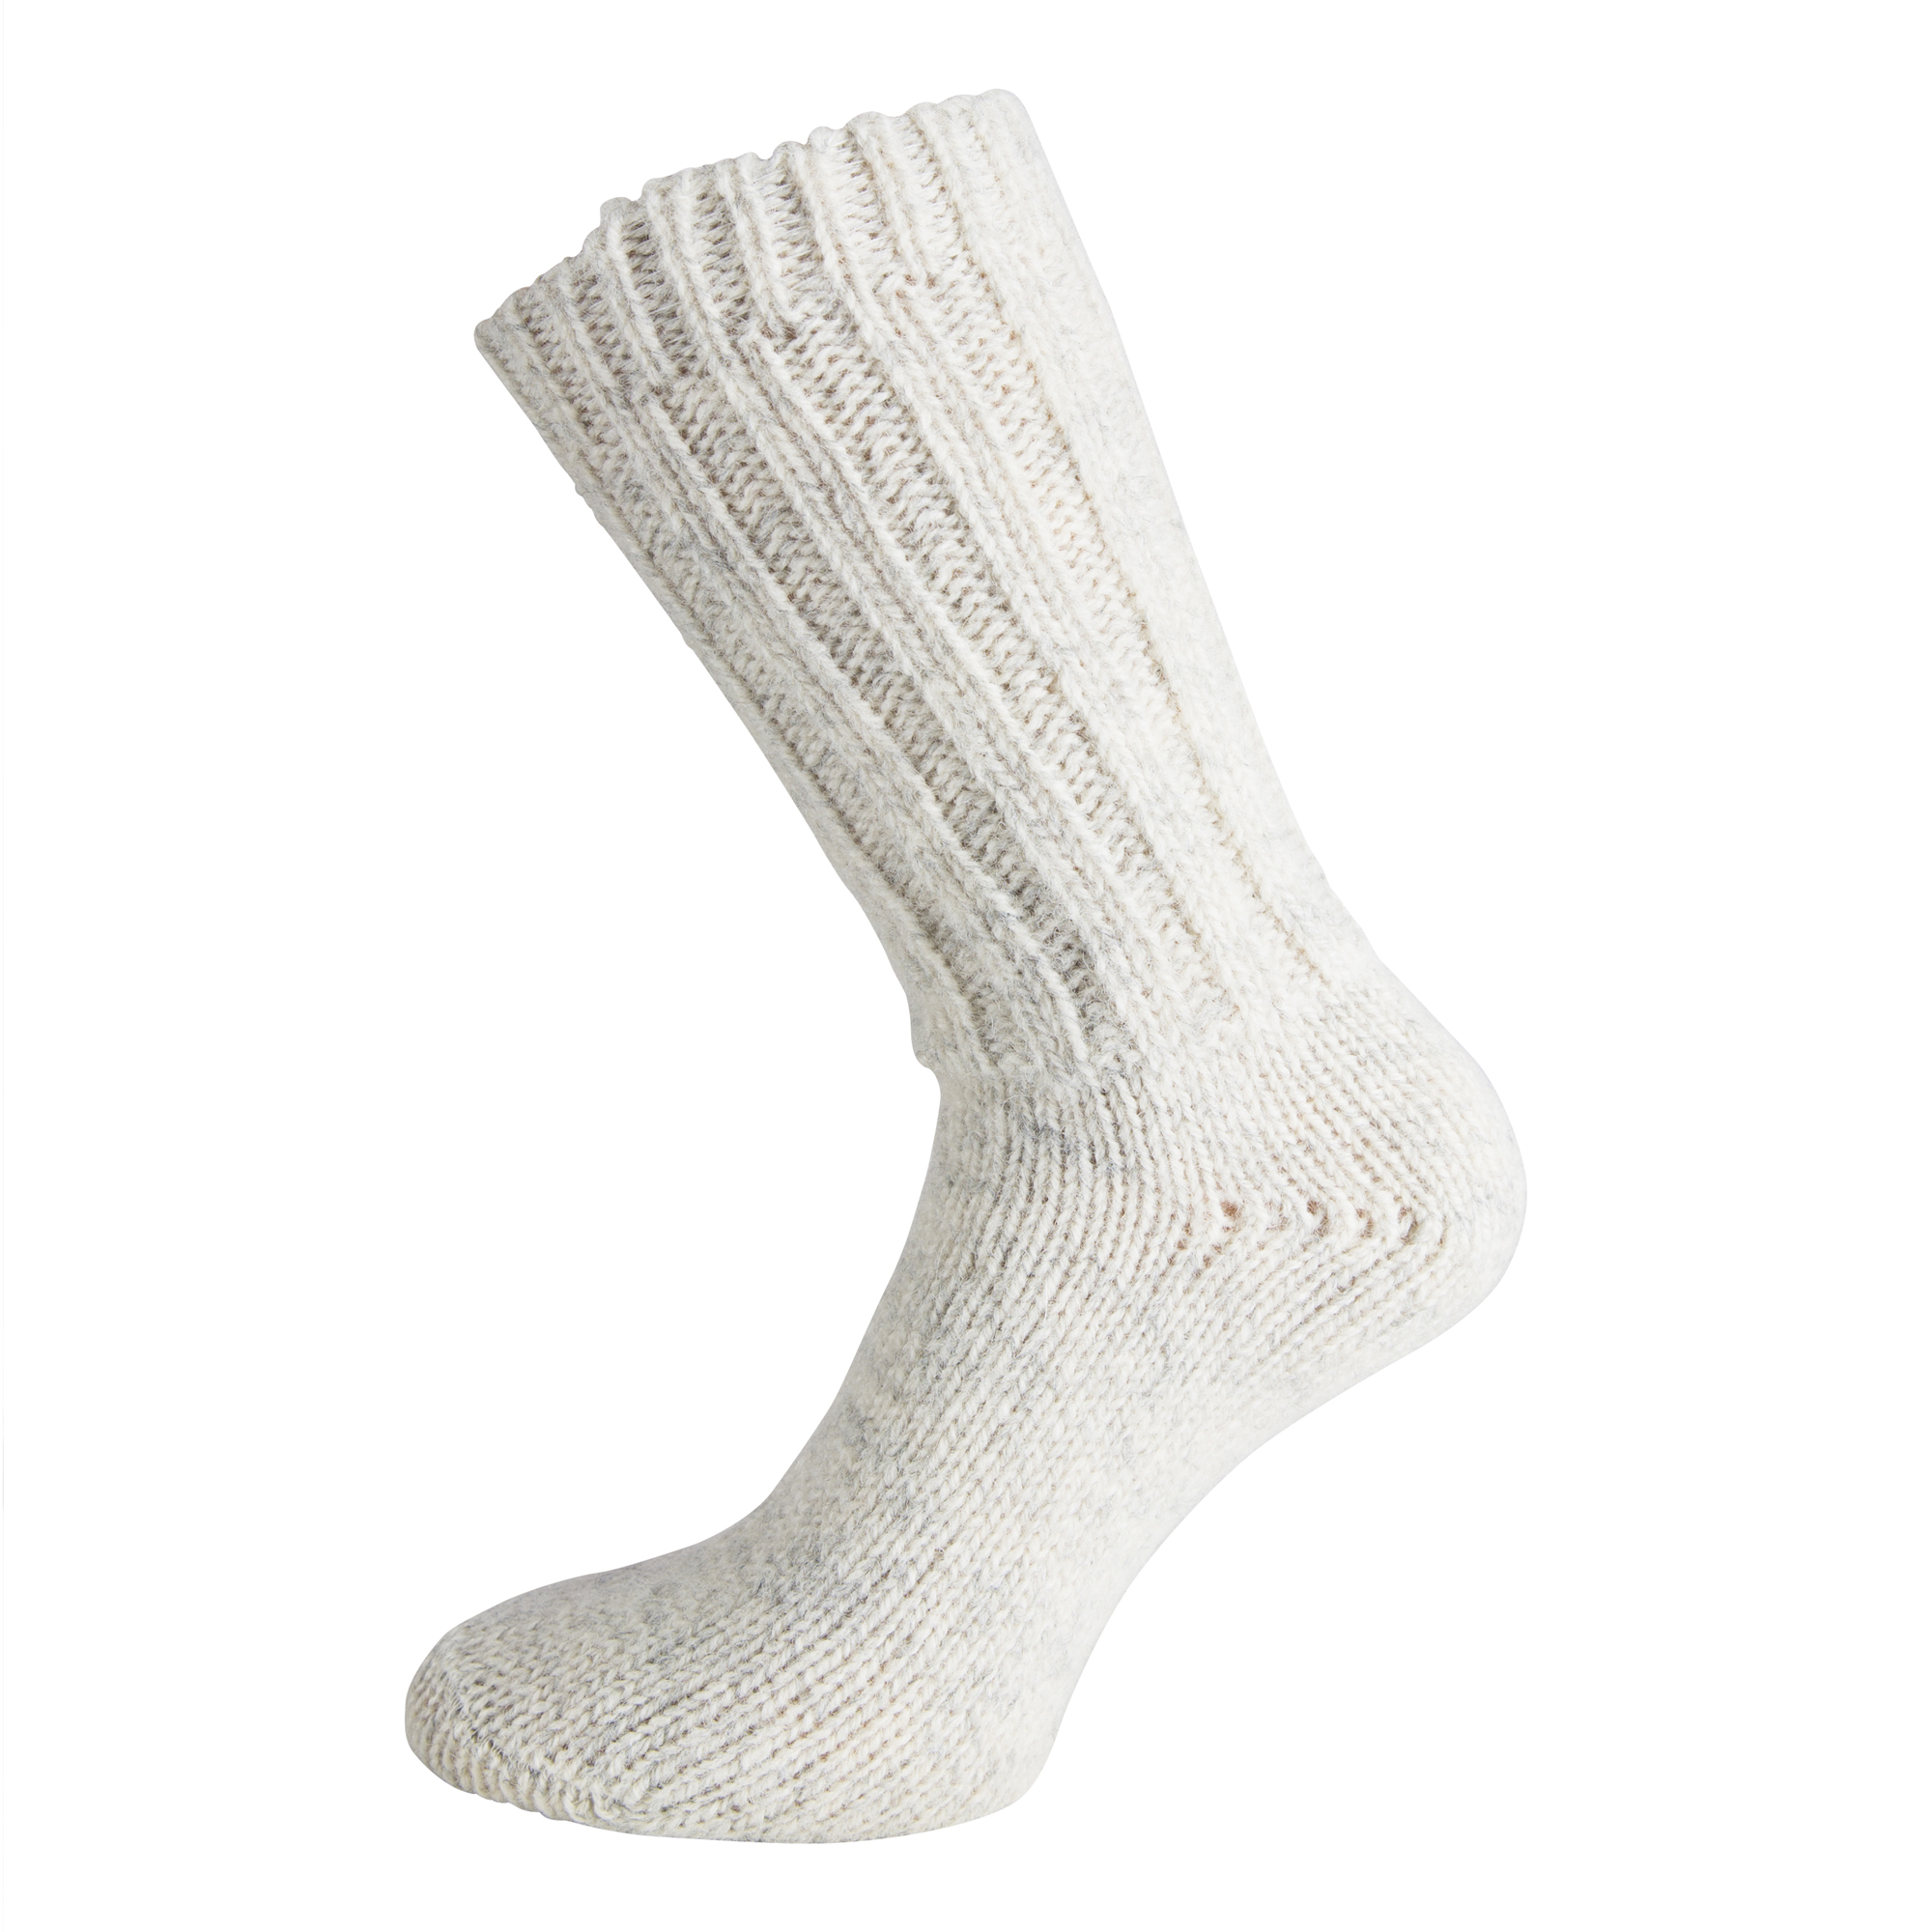 Ulvang Raggsokk - Kraftig uldsok - Natur | Socks